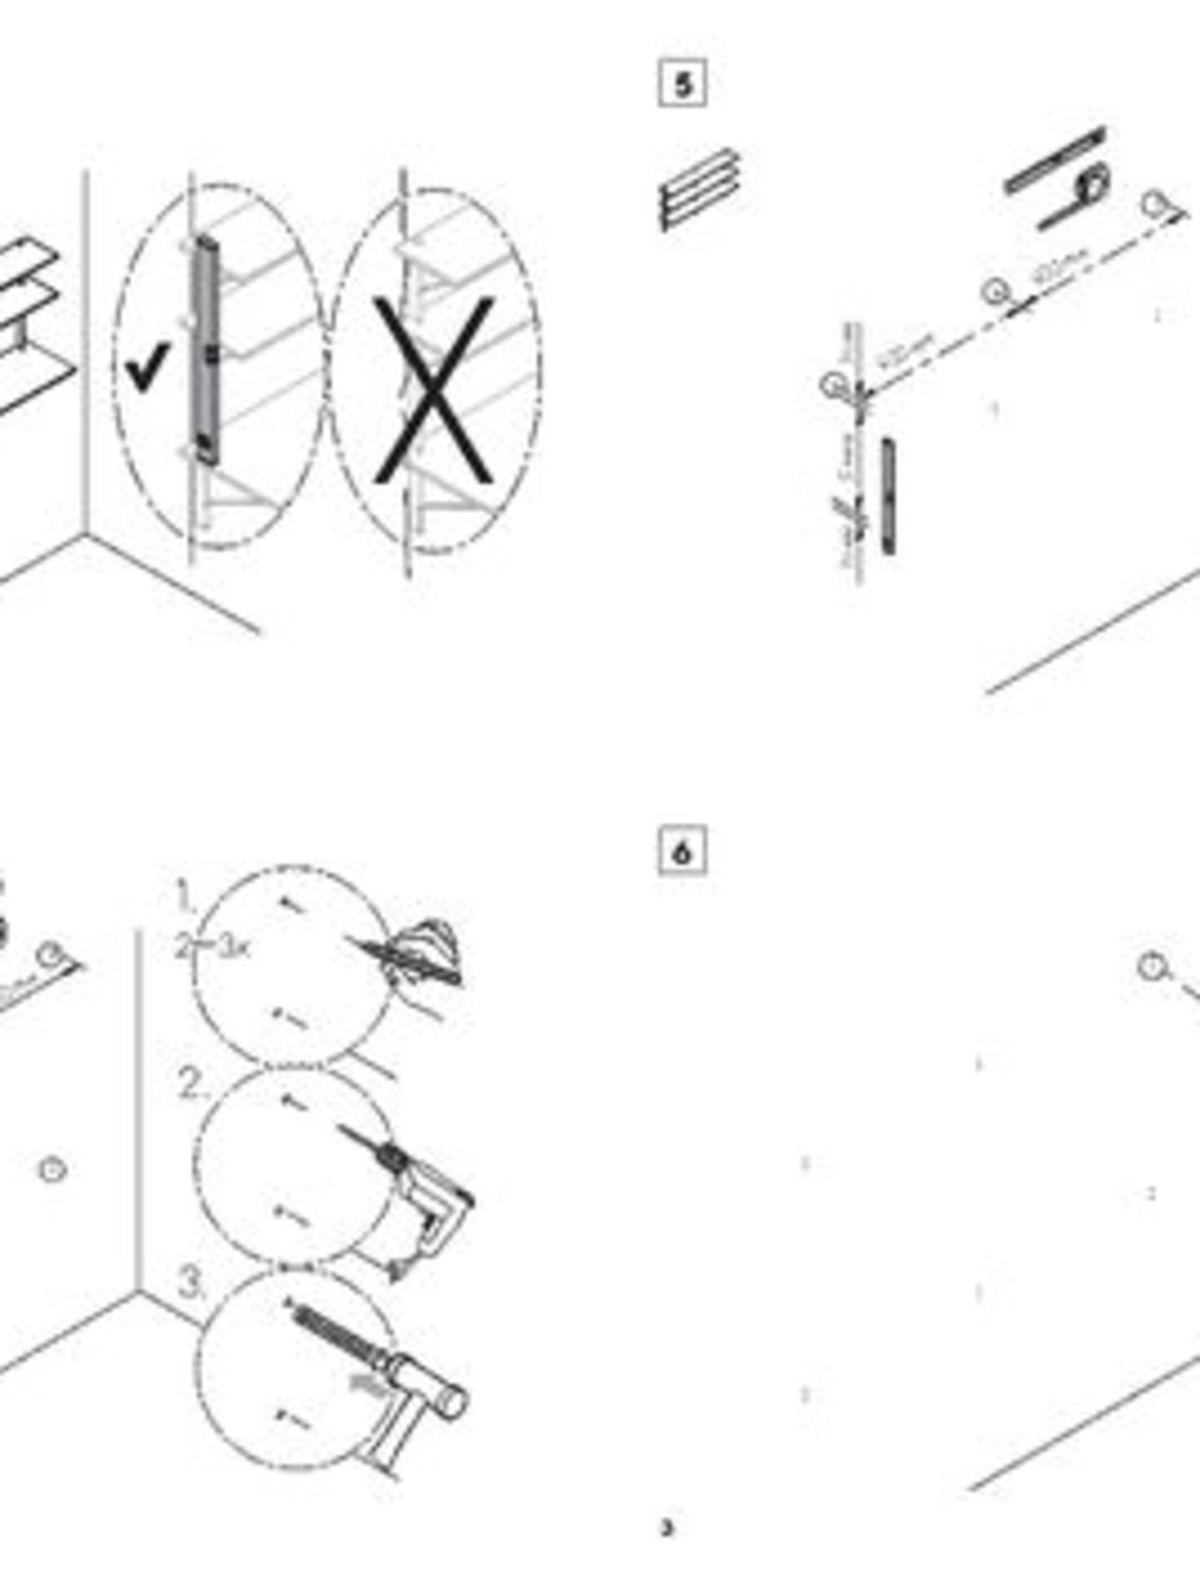 Kaari Wall Shelf REB008 Wall Shelf with Desk REB010 REB013 User Instruction